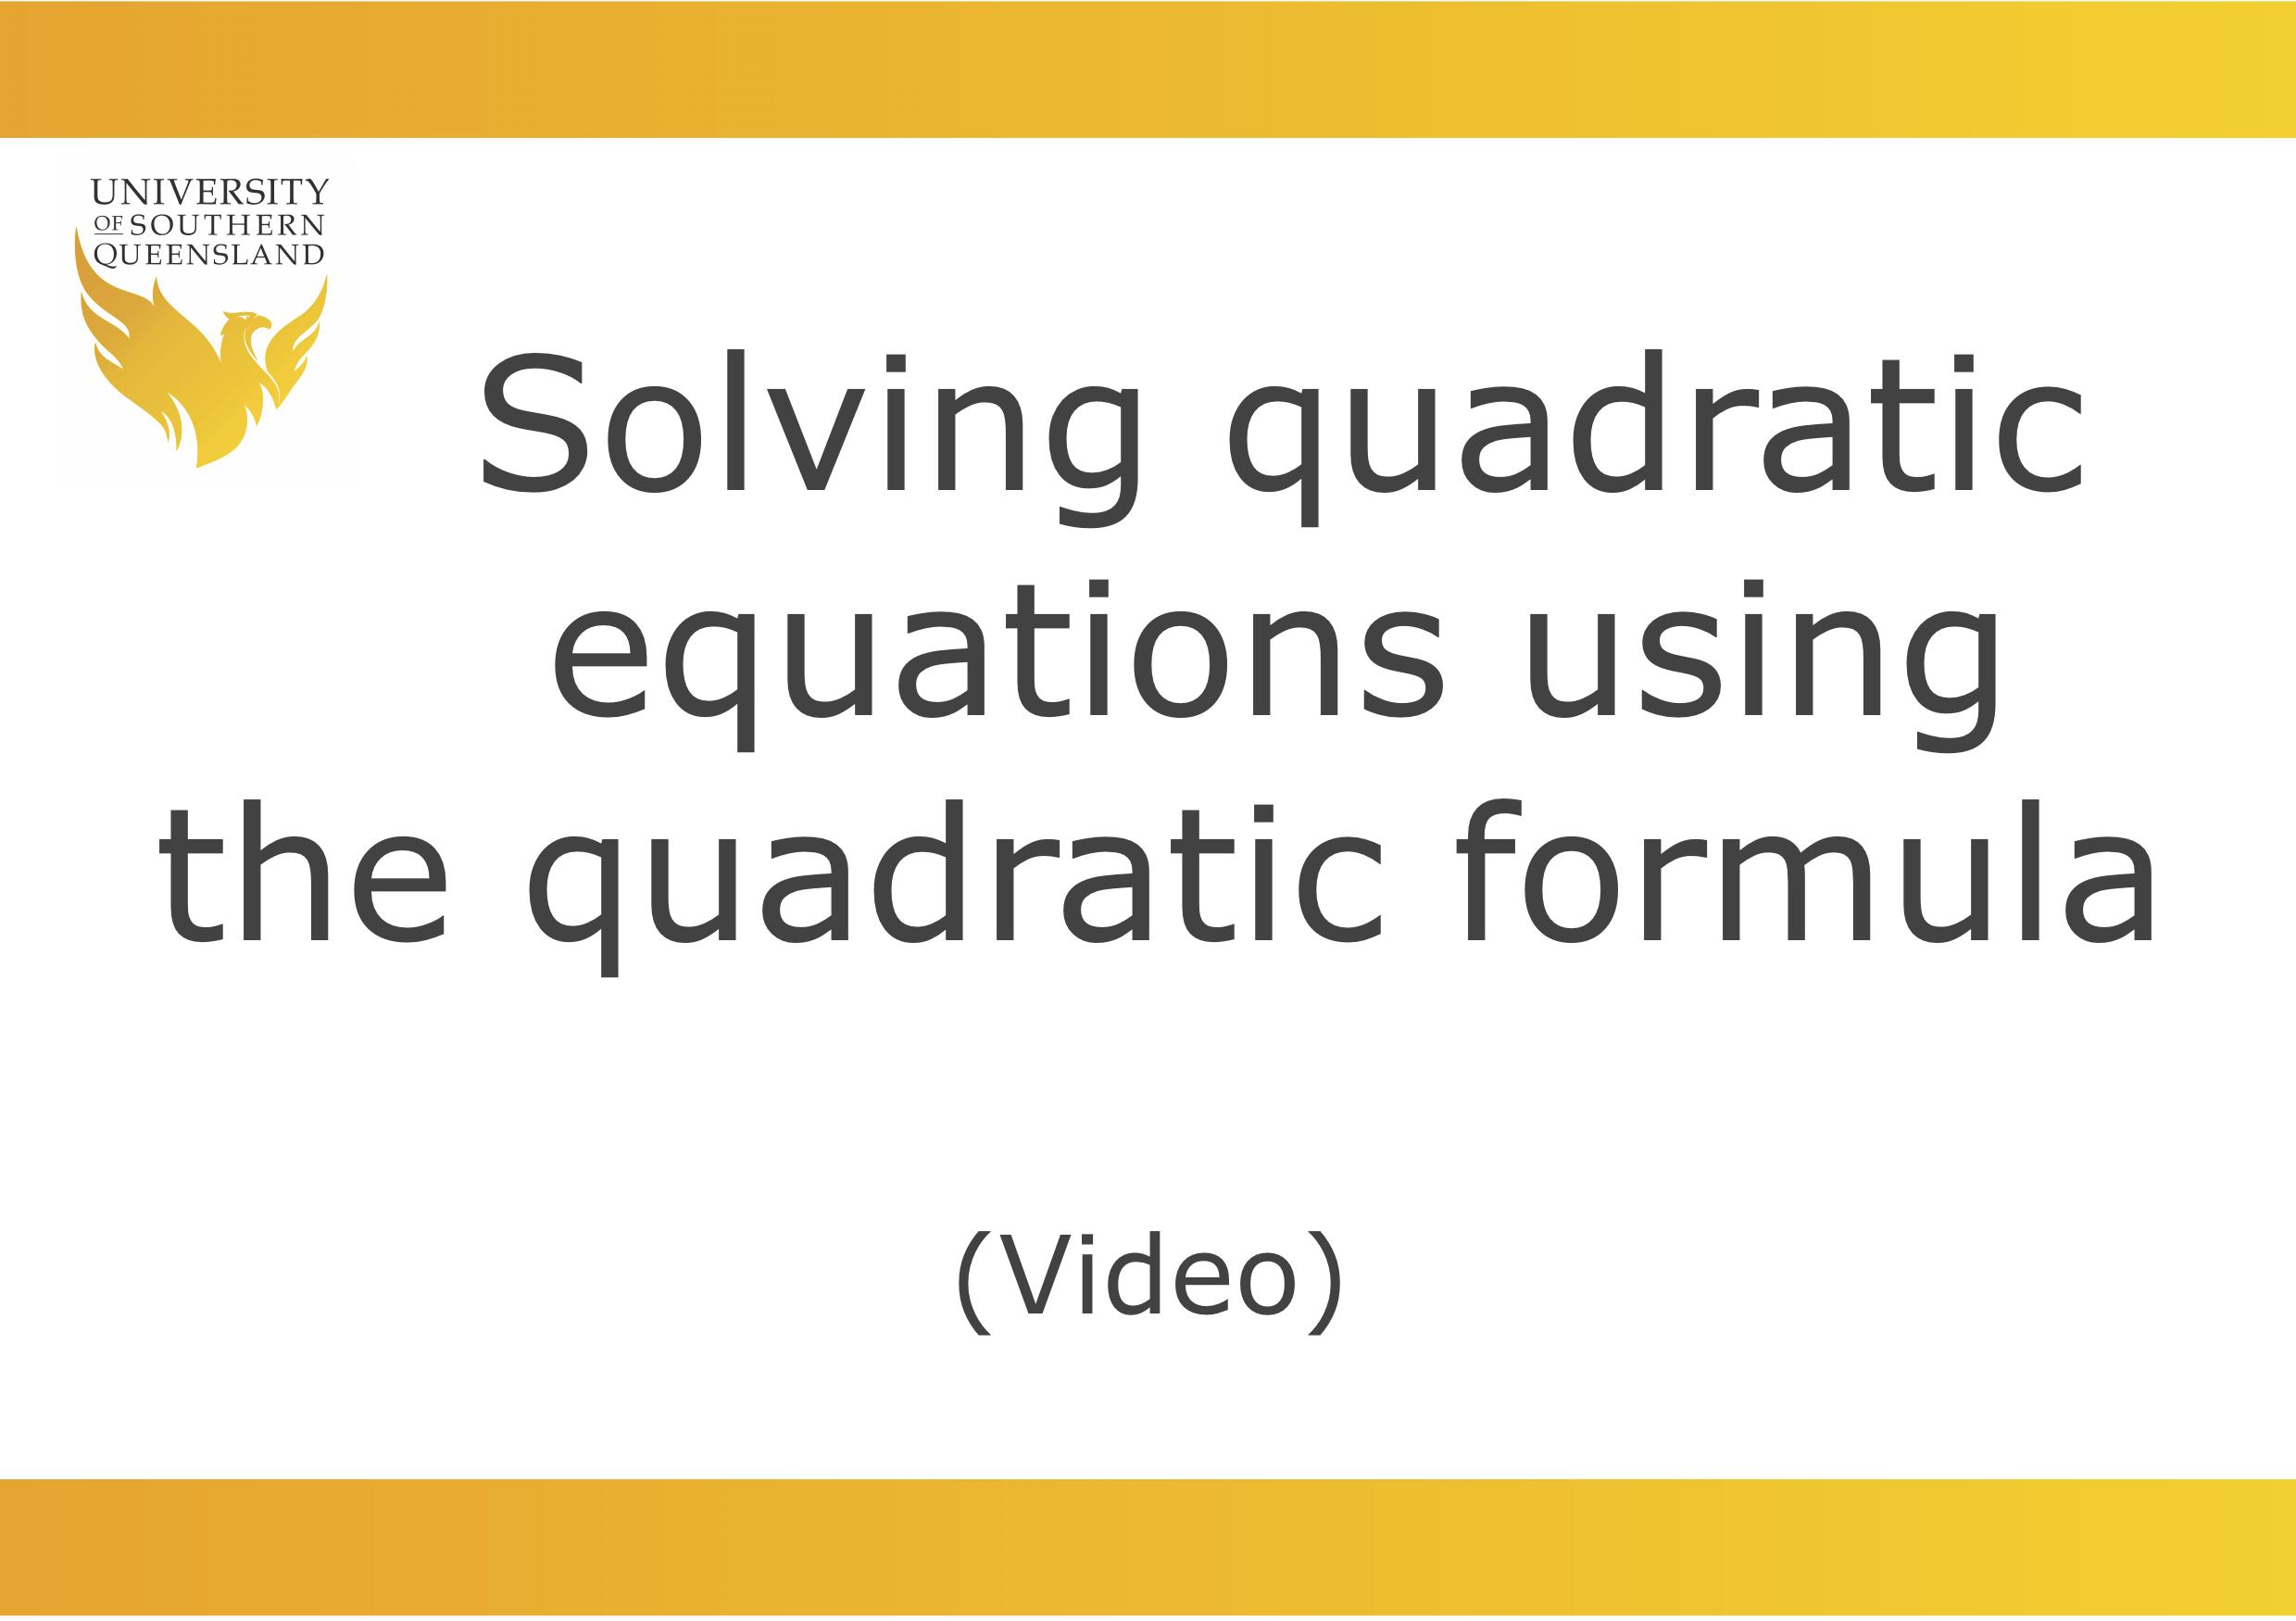 Solving quadratic equations using the quadratic formula video